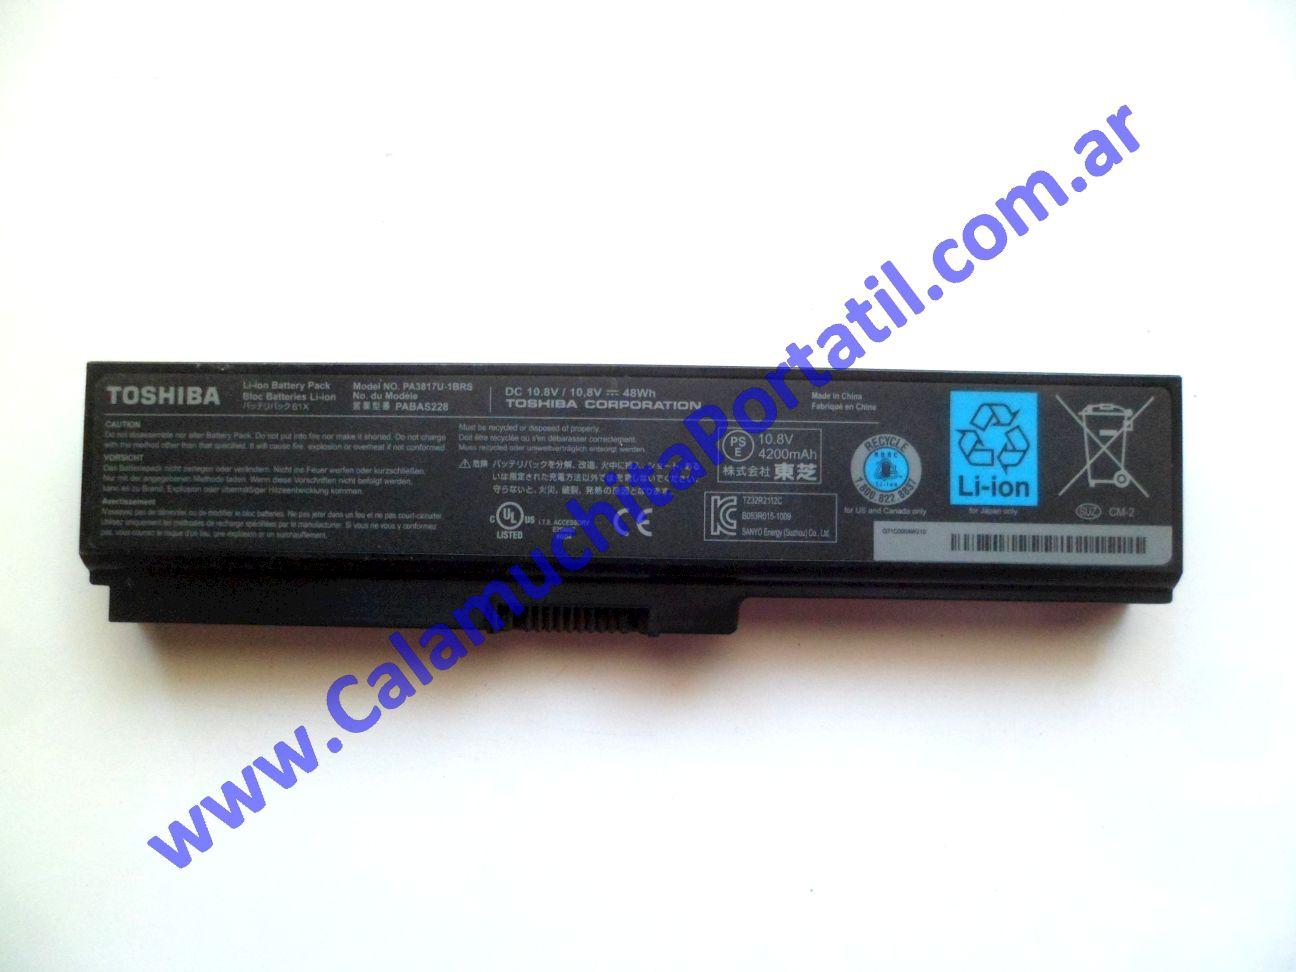 0523BAA Batería Toshiba Satellite C655D-S5529 / PSC0YU-0415M